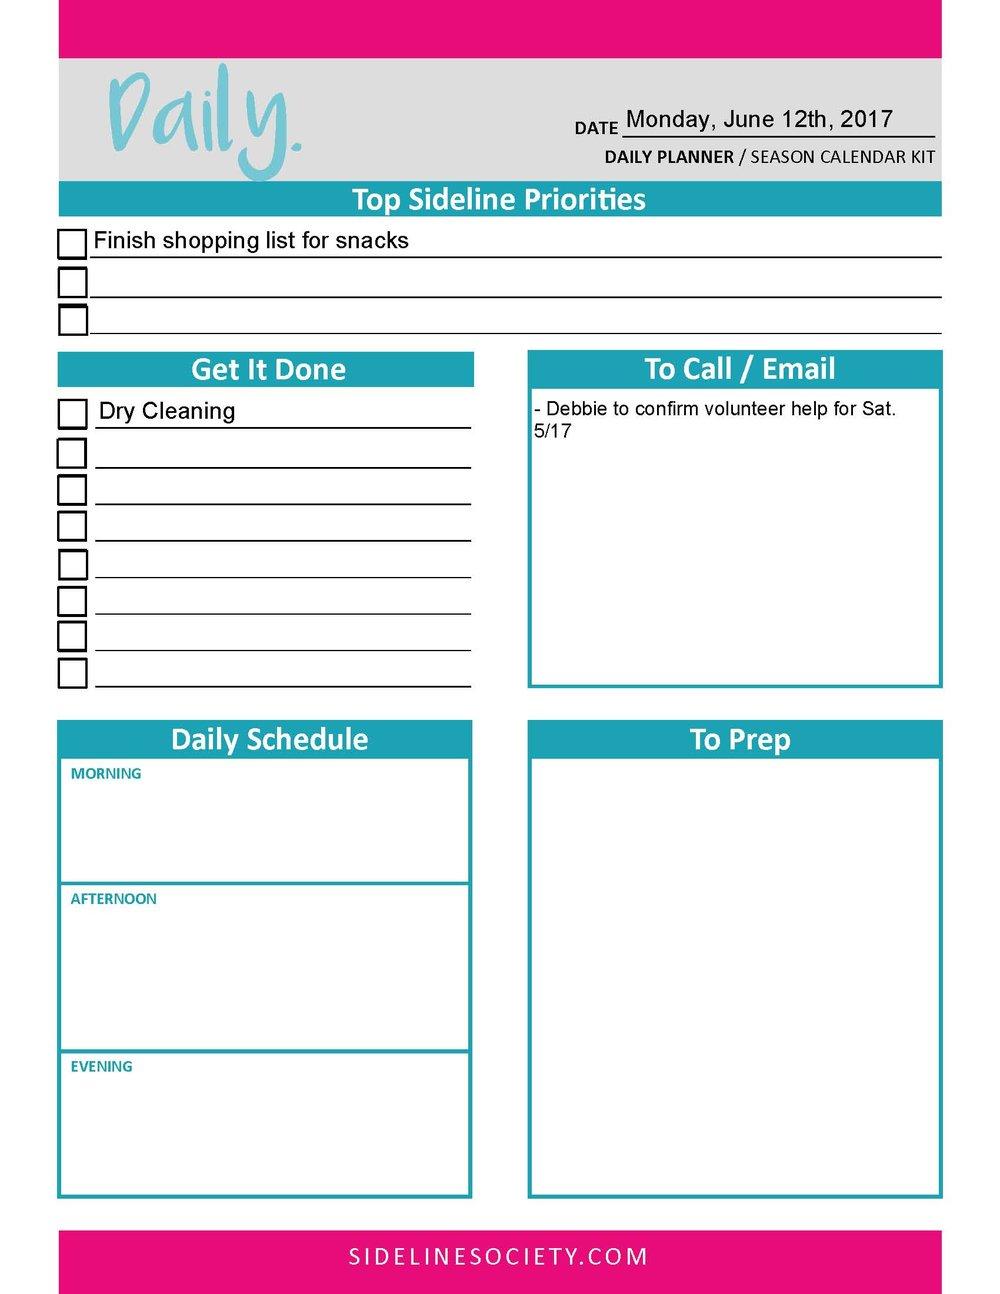 Daily Planner (Season Calendar Kit)